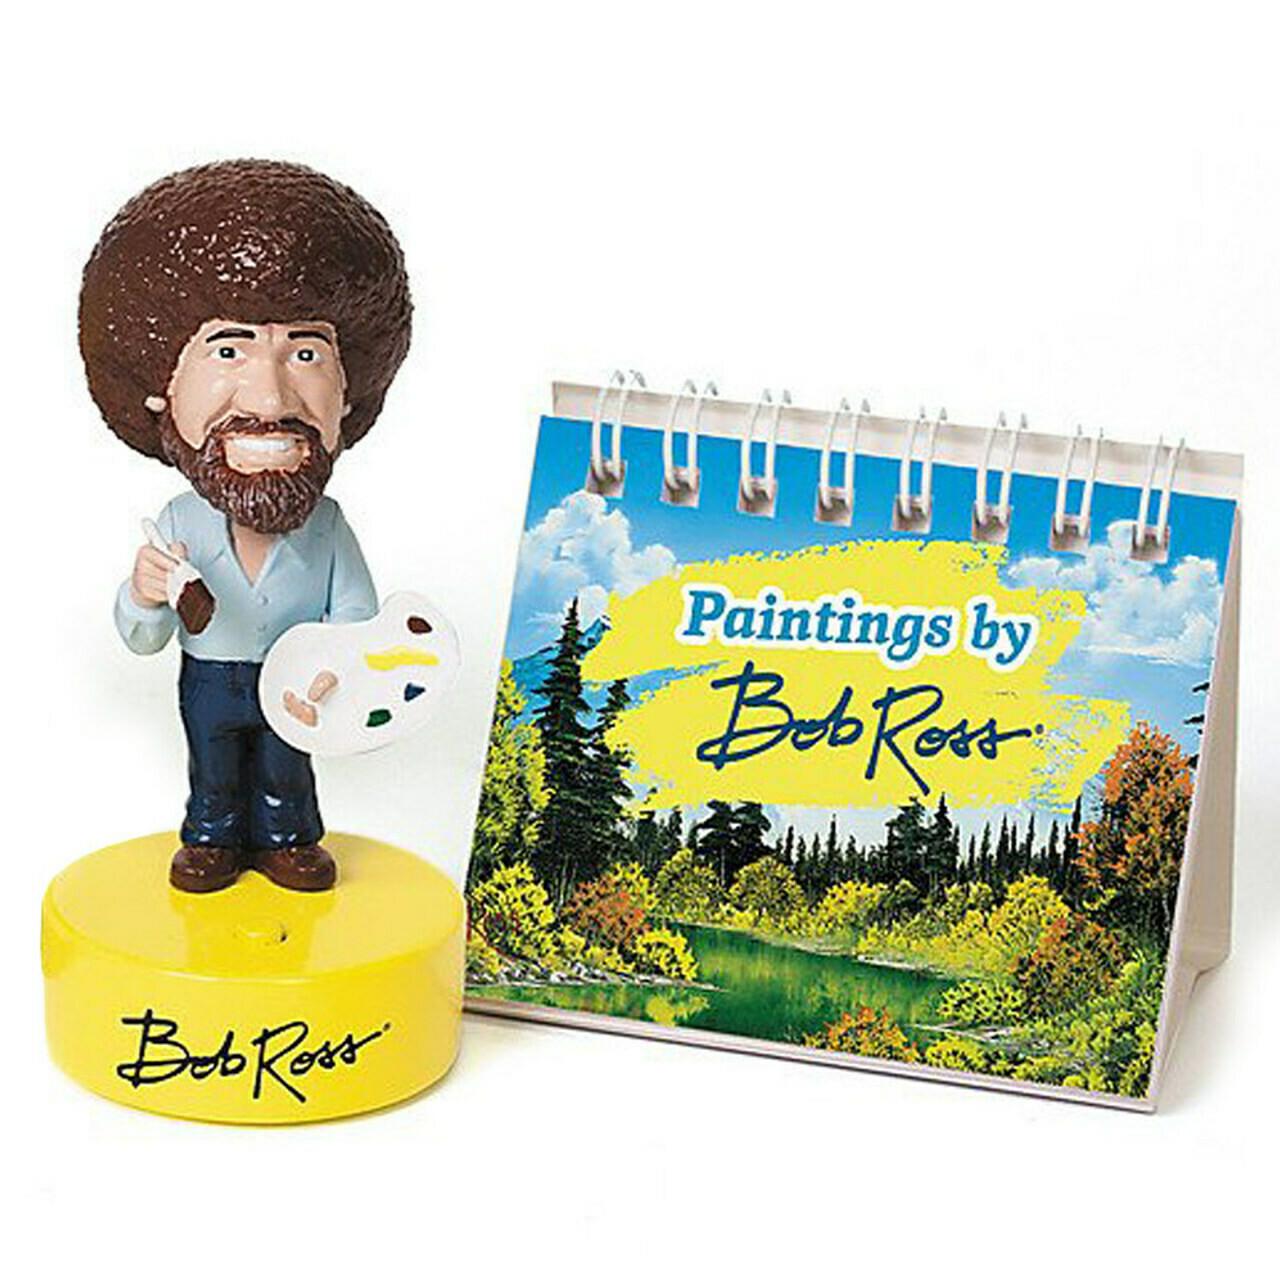 Bob Ross Mini Bobblehead